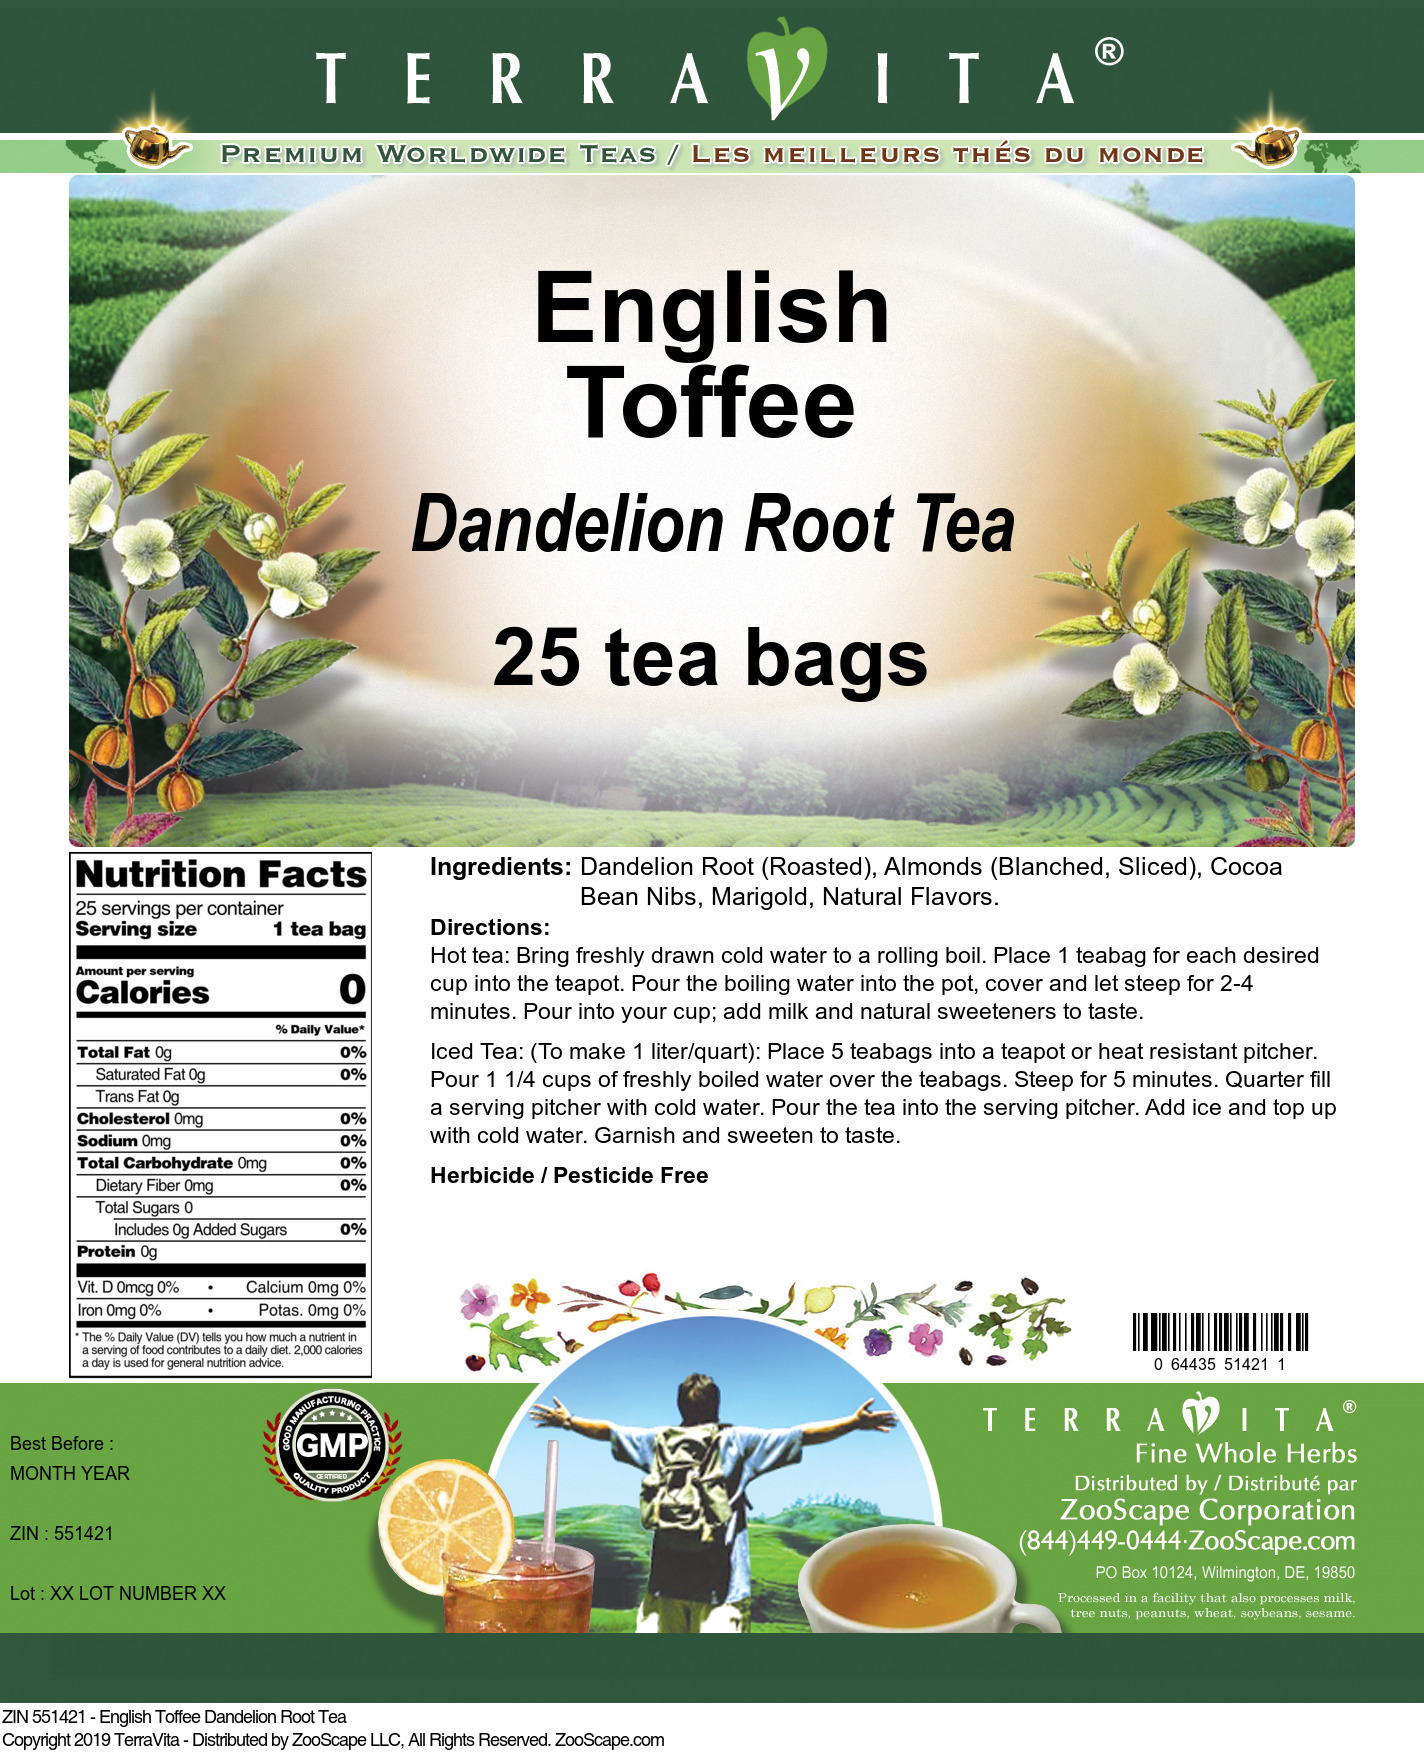 English Toffee Dandelion Root